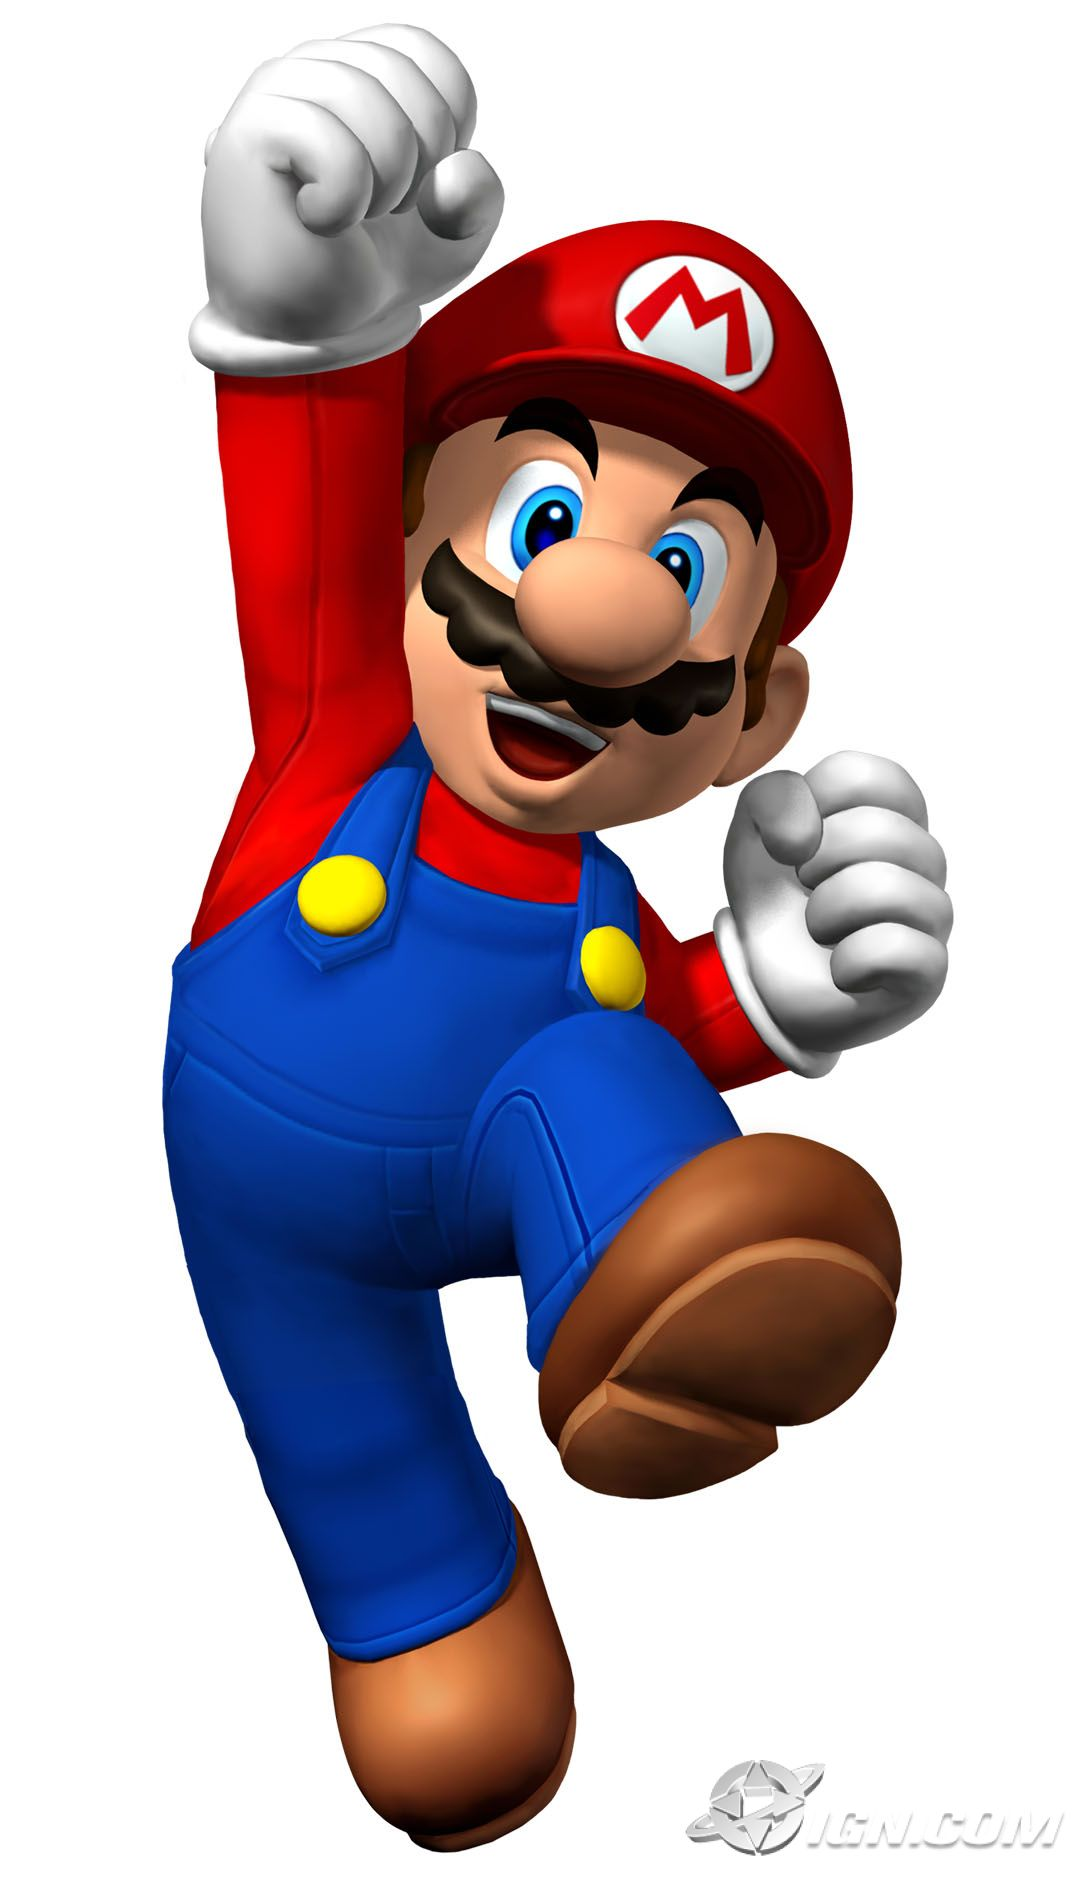 Luxe Image De Mario A Imprimer En Couleur